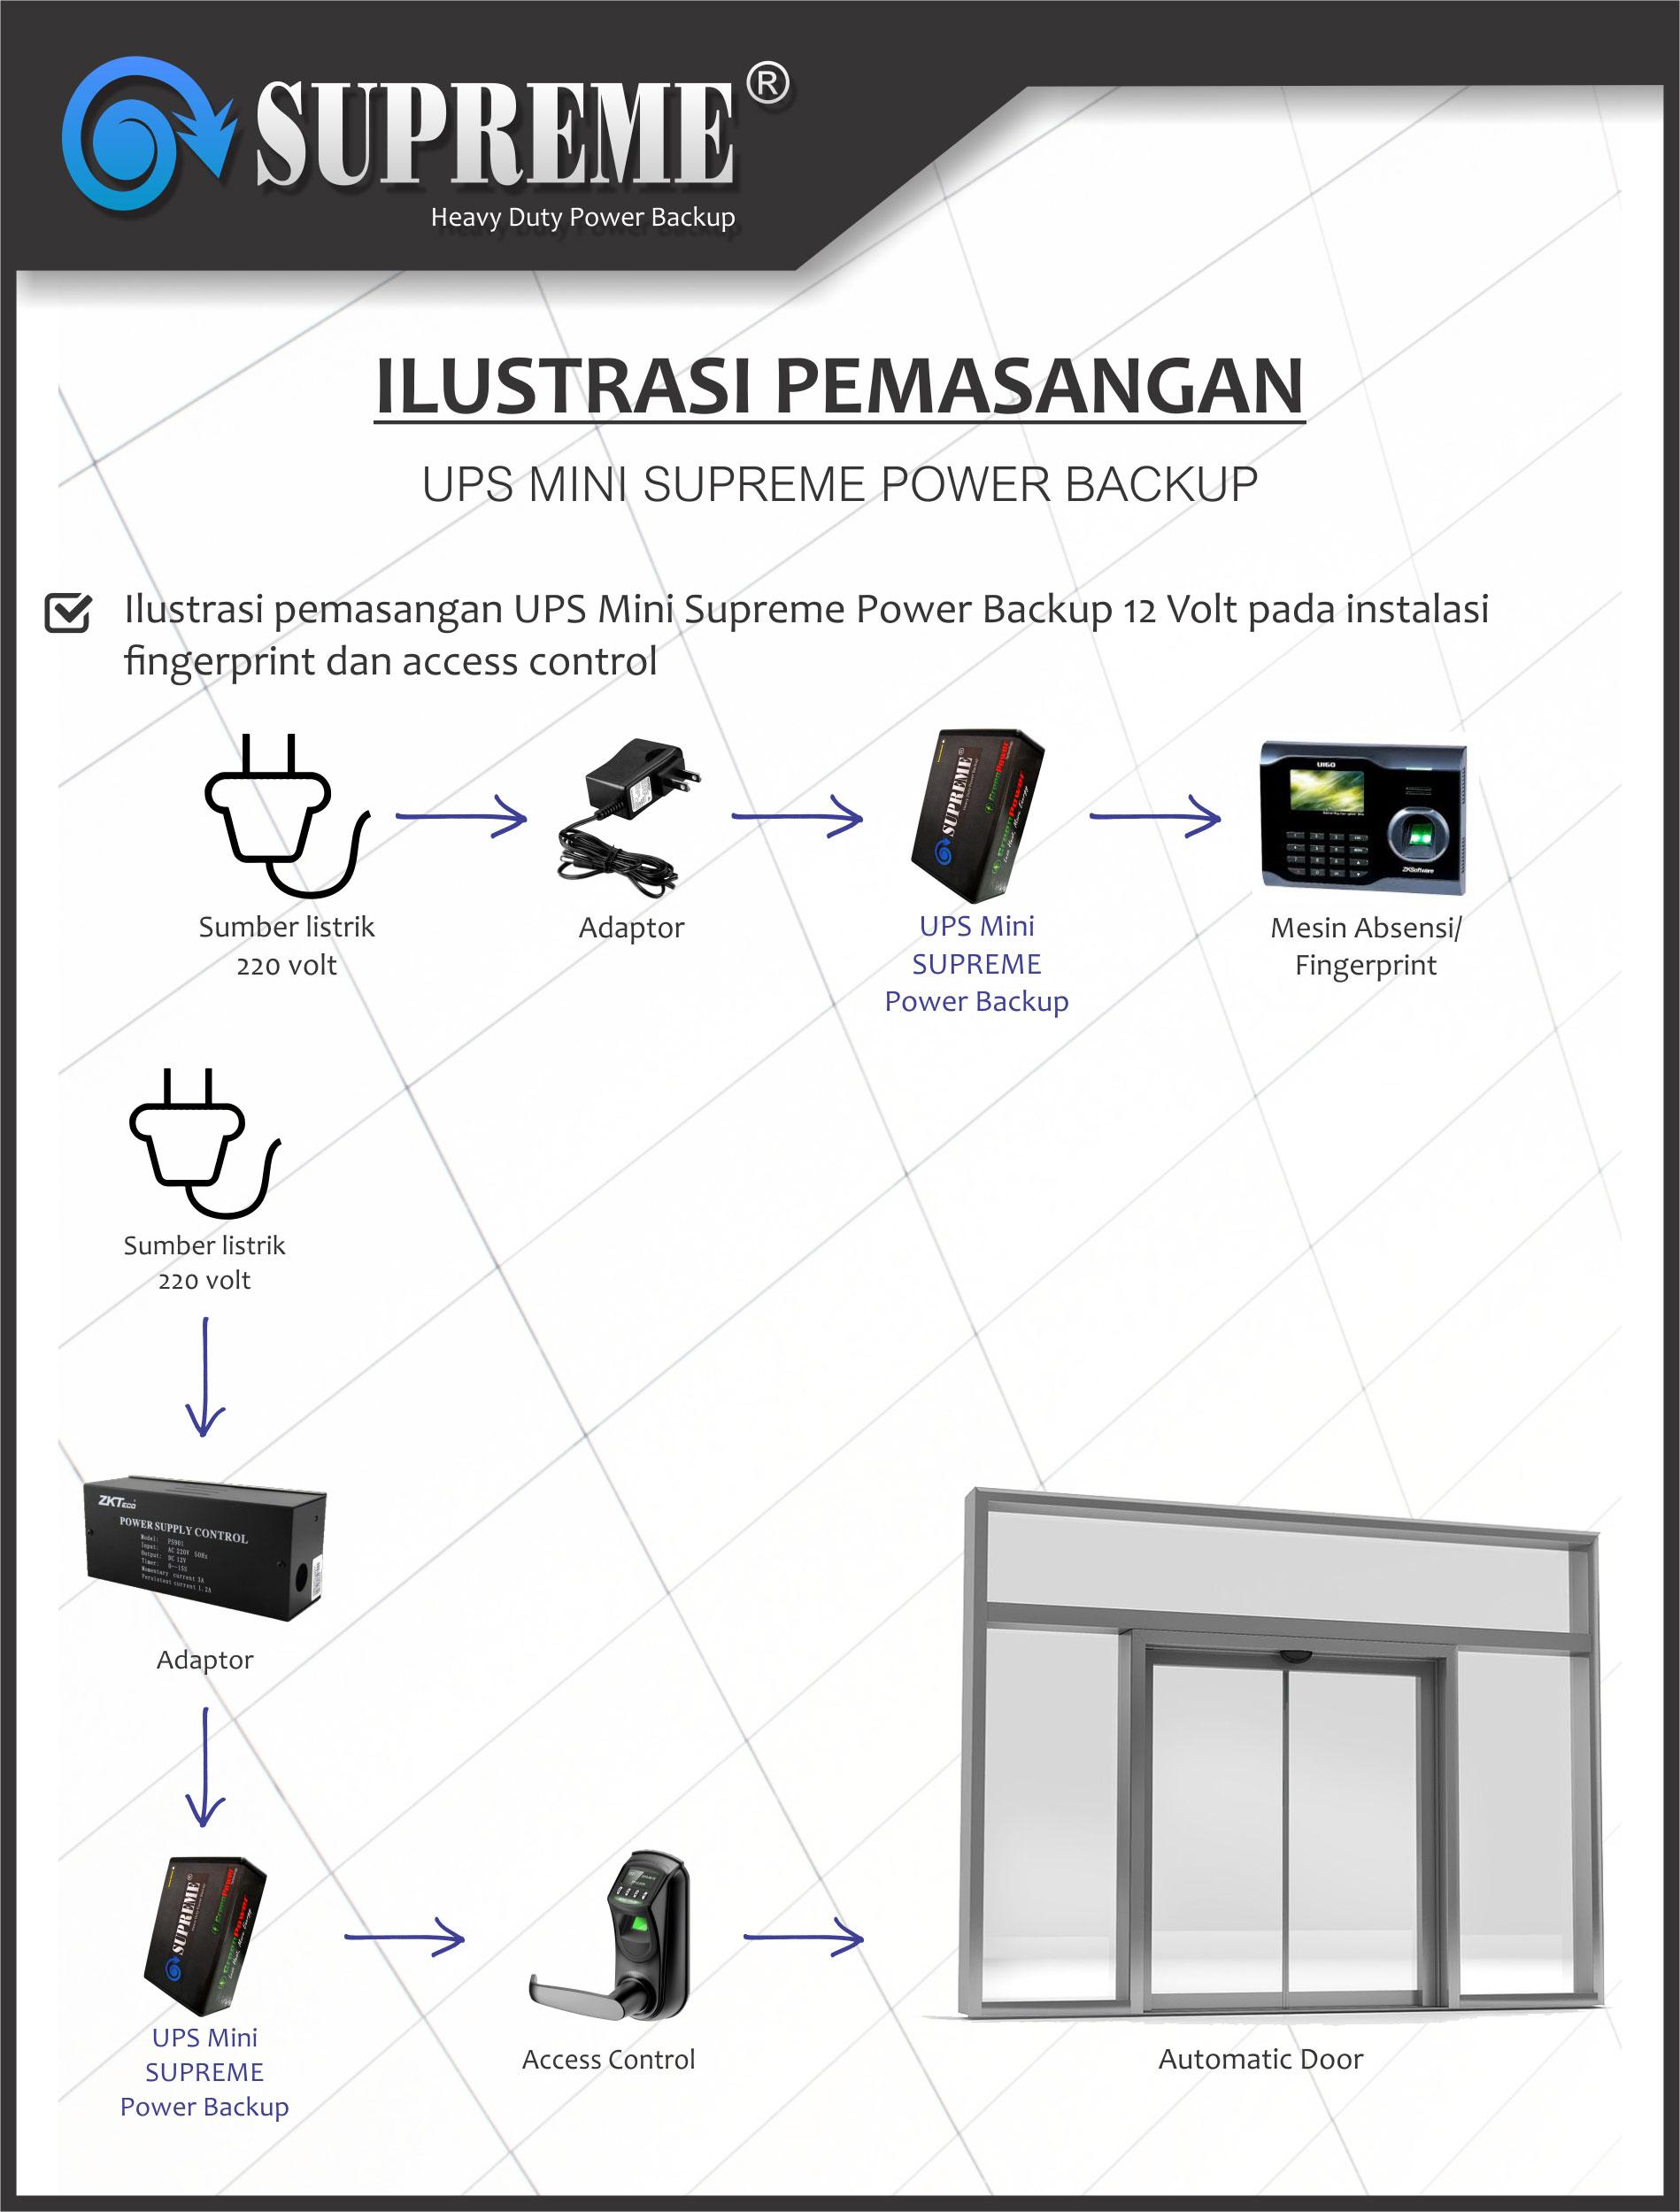 Smart UPS Mini Portable 5V untuk CCTV, IPcam, Fingerprint